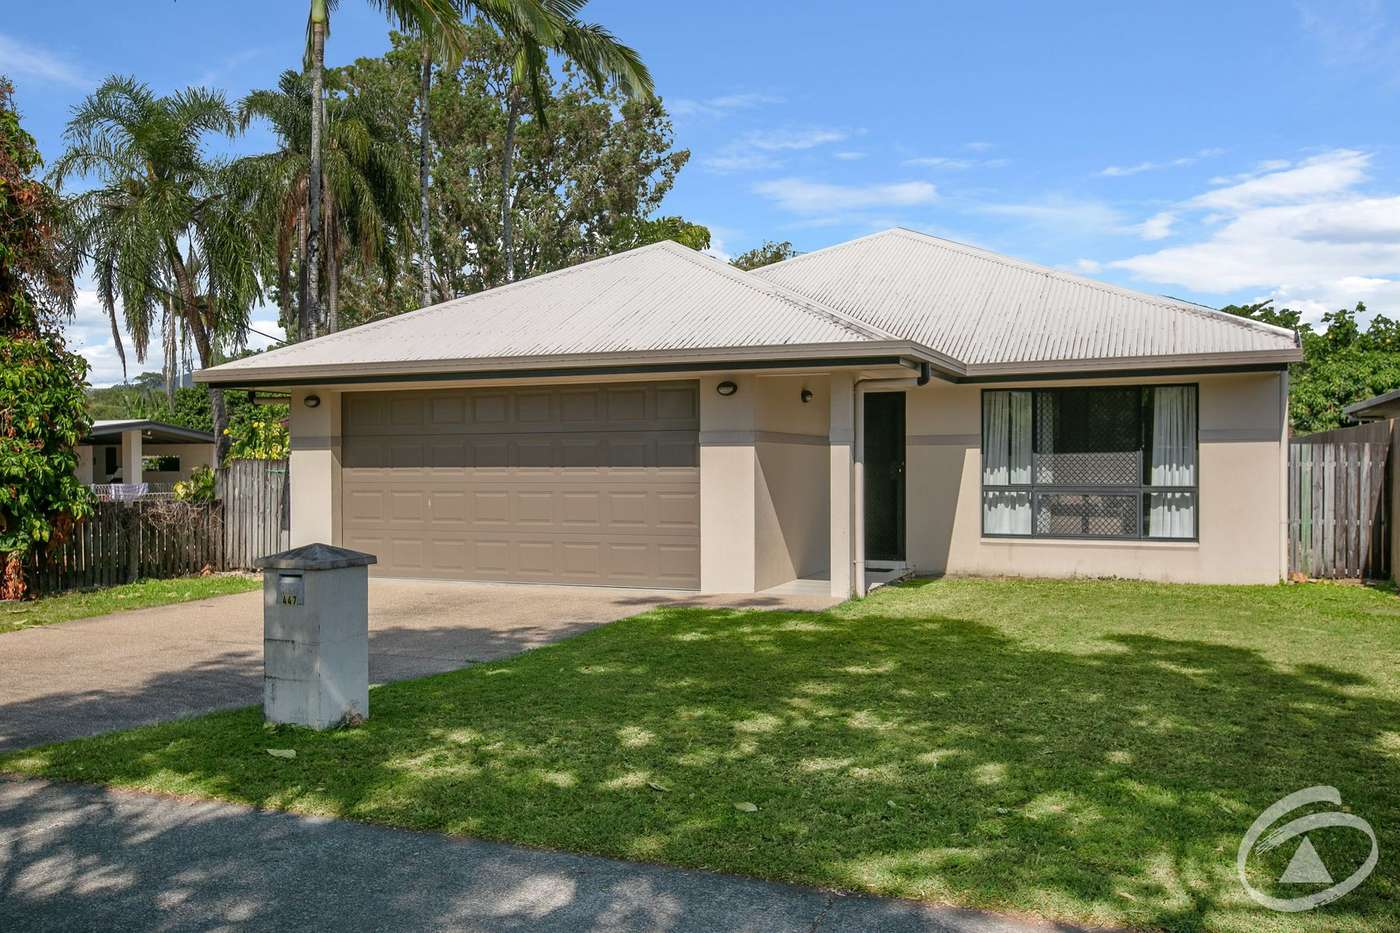 Main view of Homely house listing, 447 Varley Street, Yorkeys Knob, QLD 4878